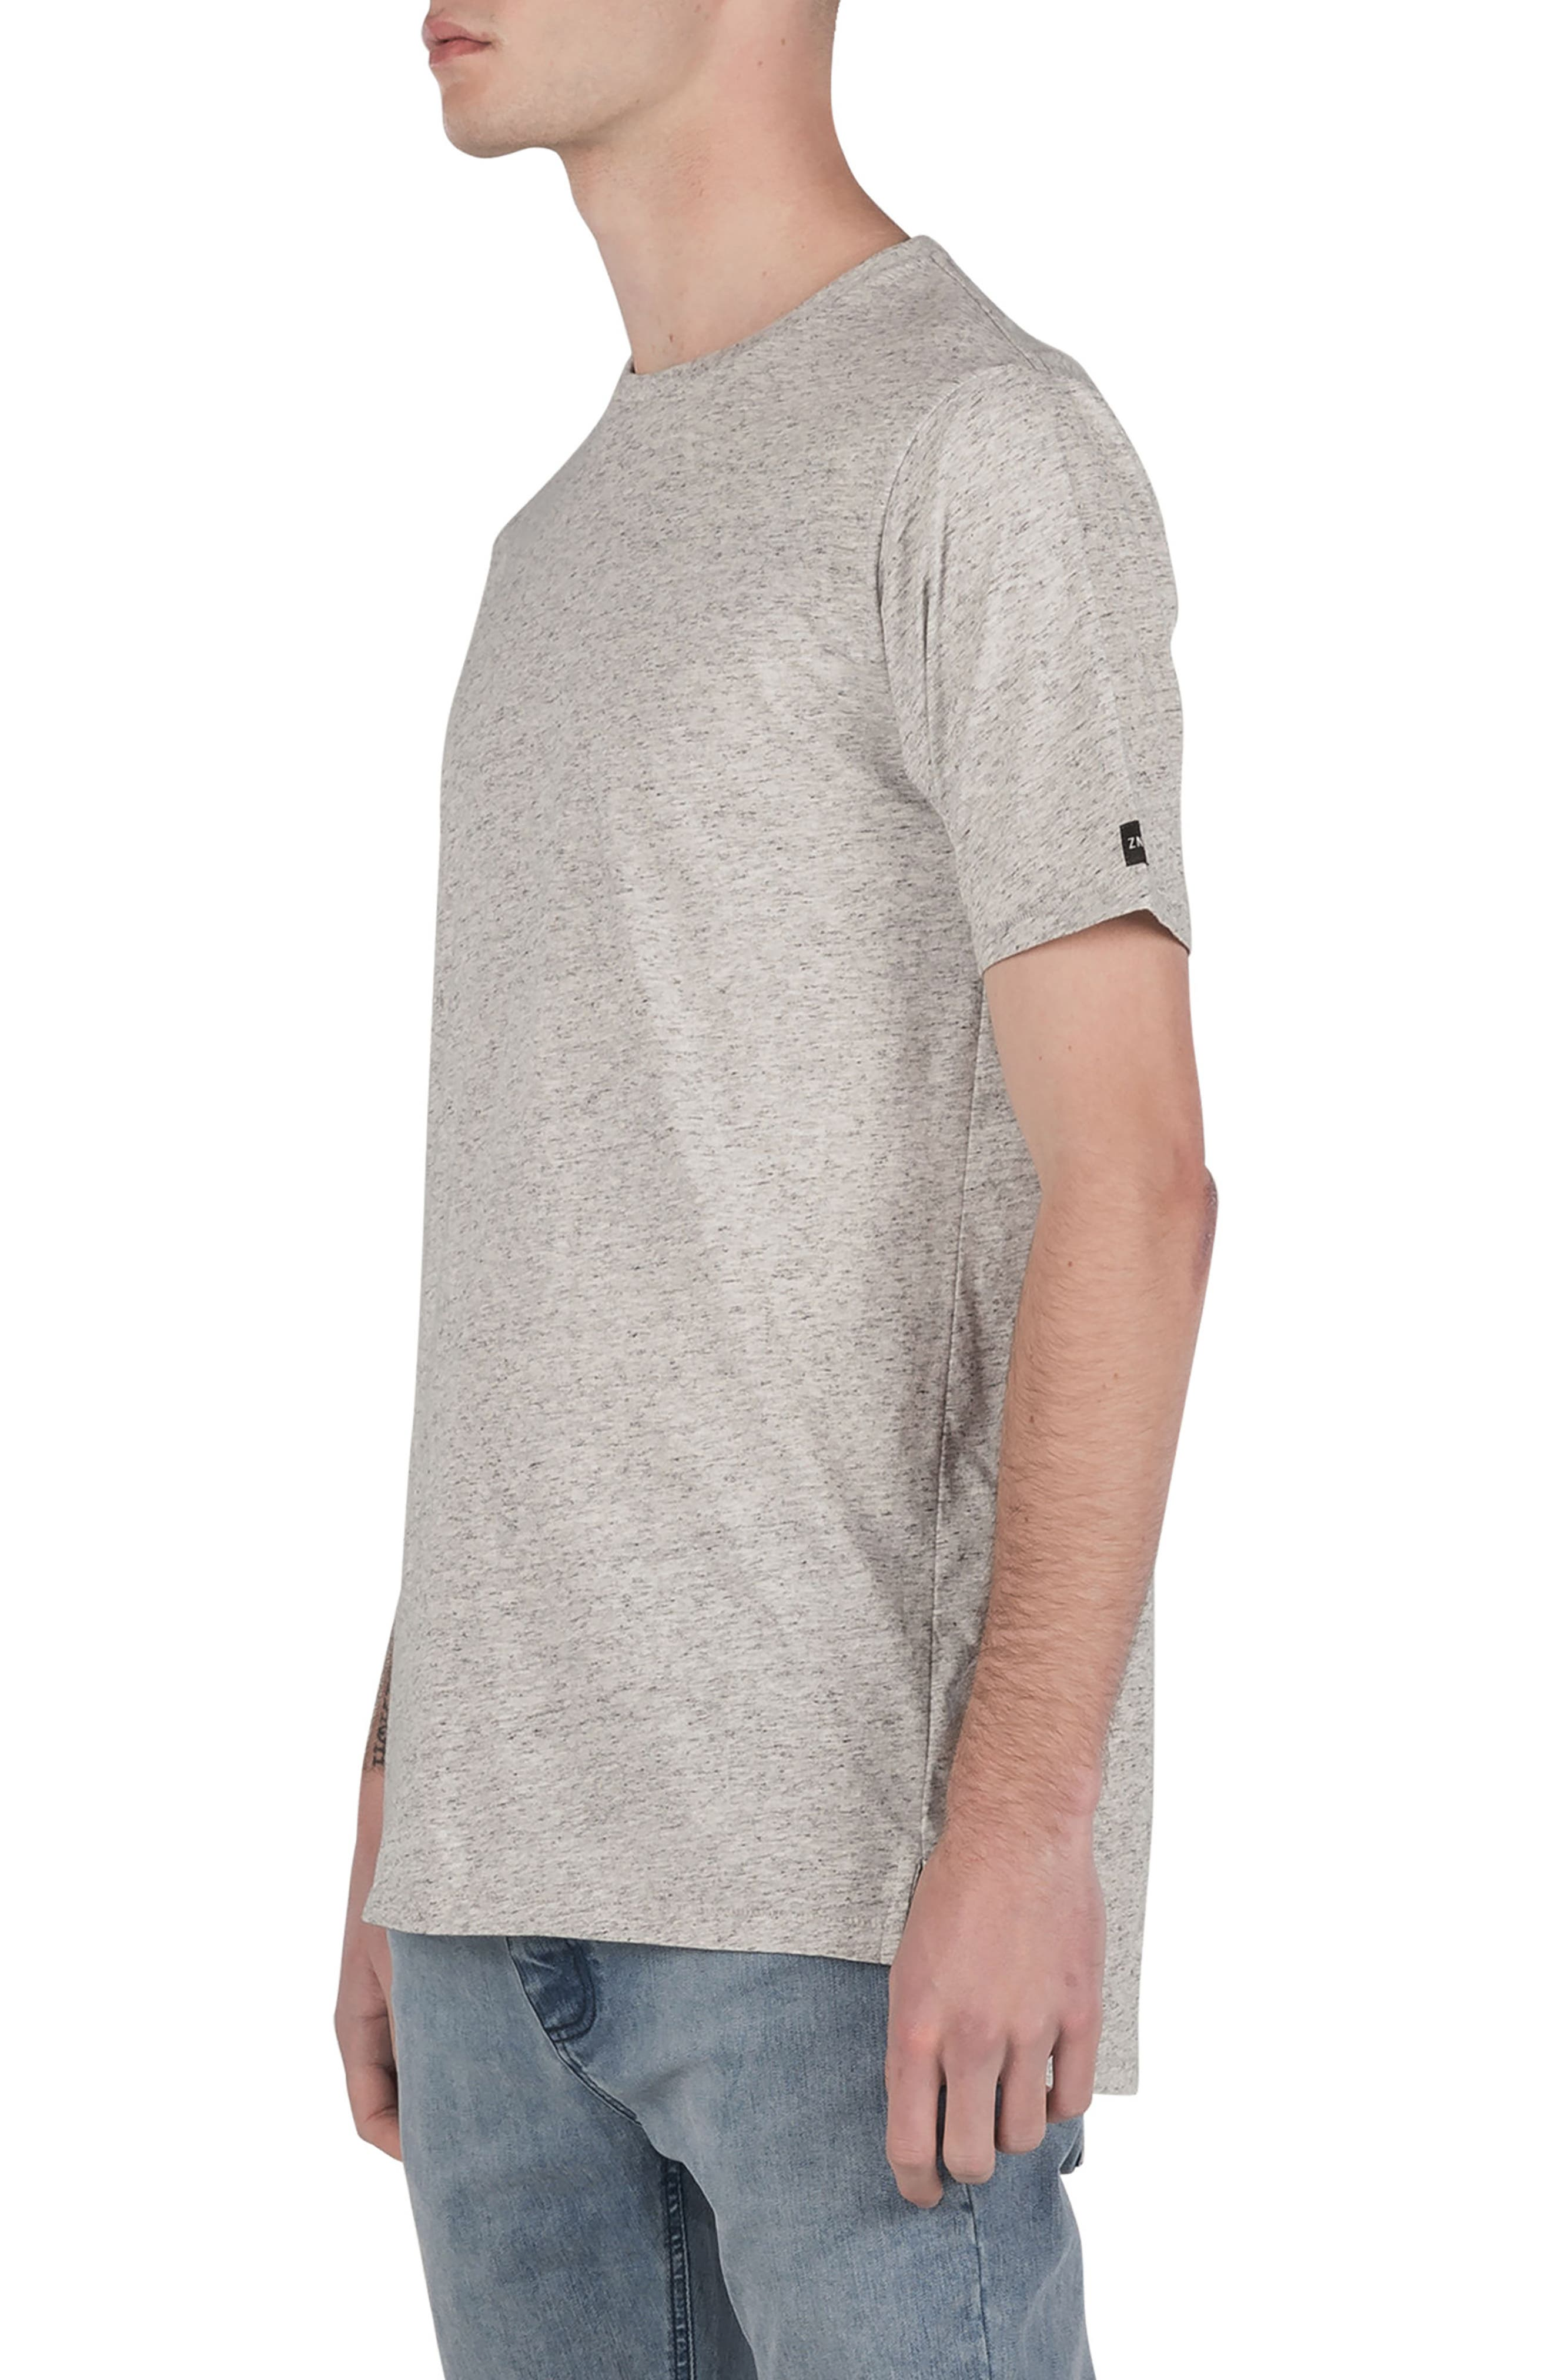 Flintlock T-Shirt,                             Alternate thumbnail 6, color,                             060